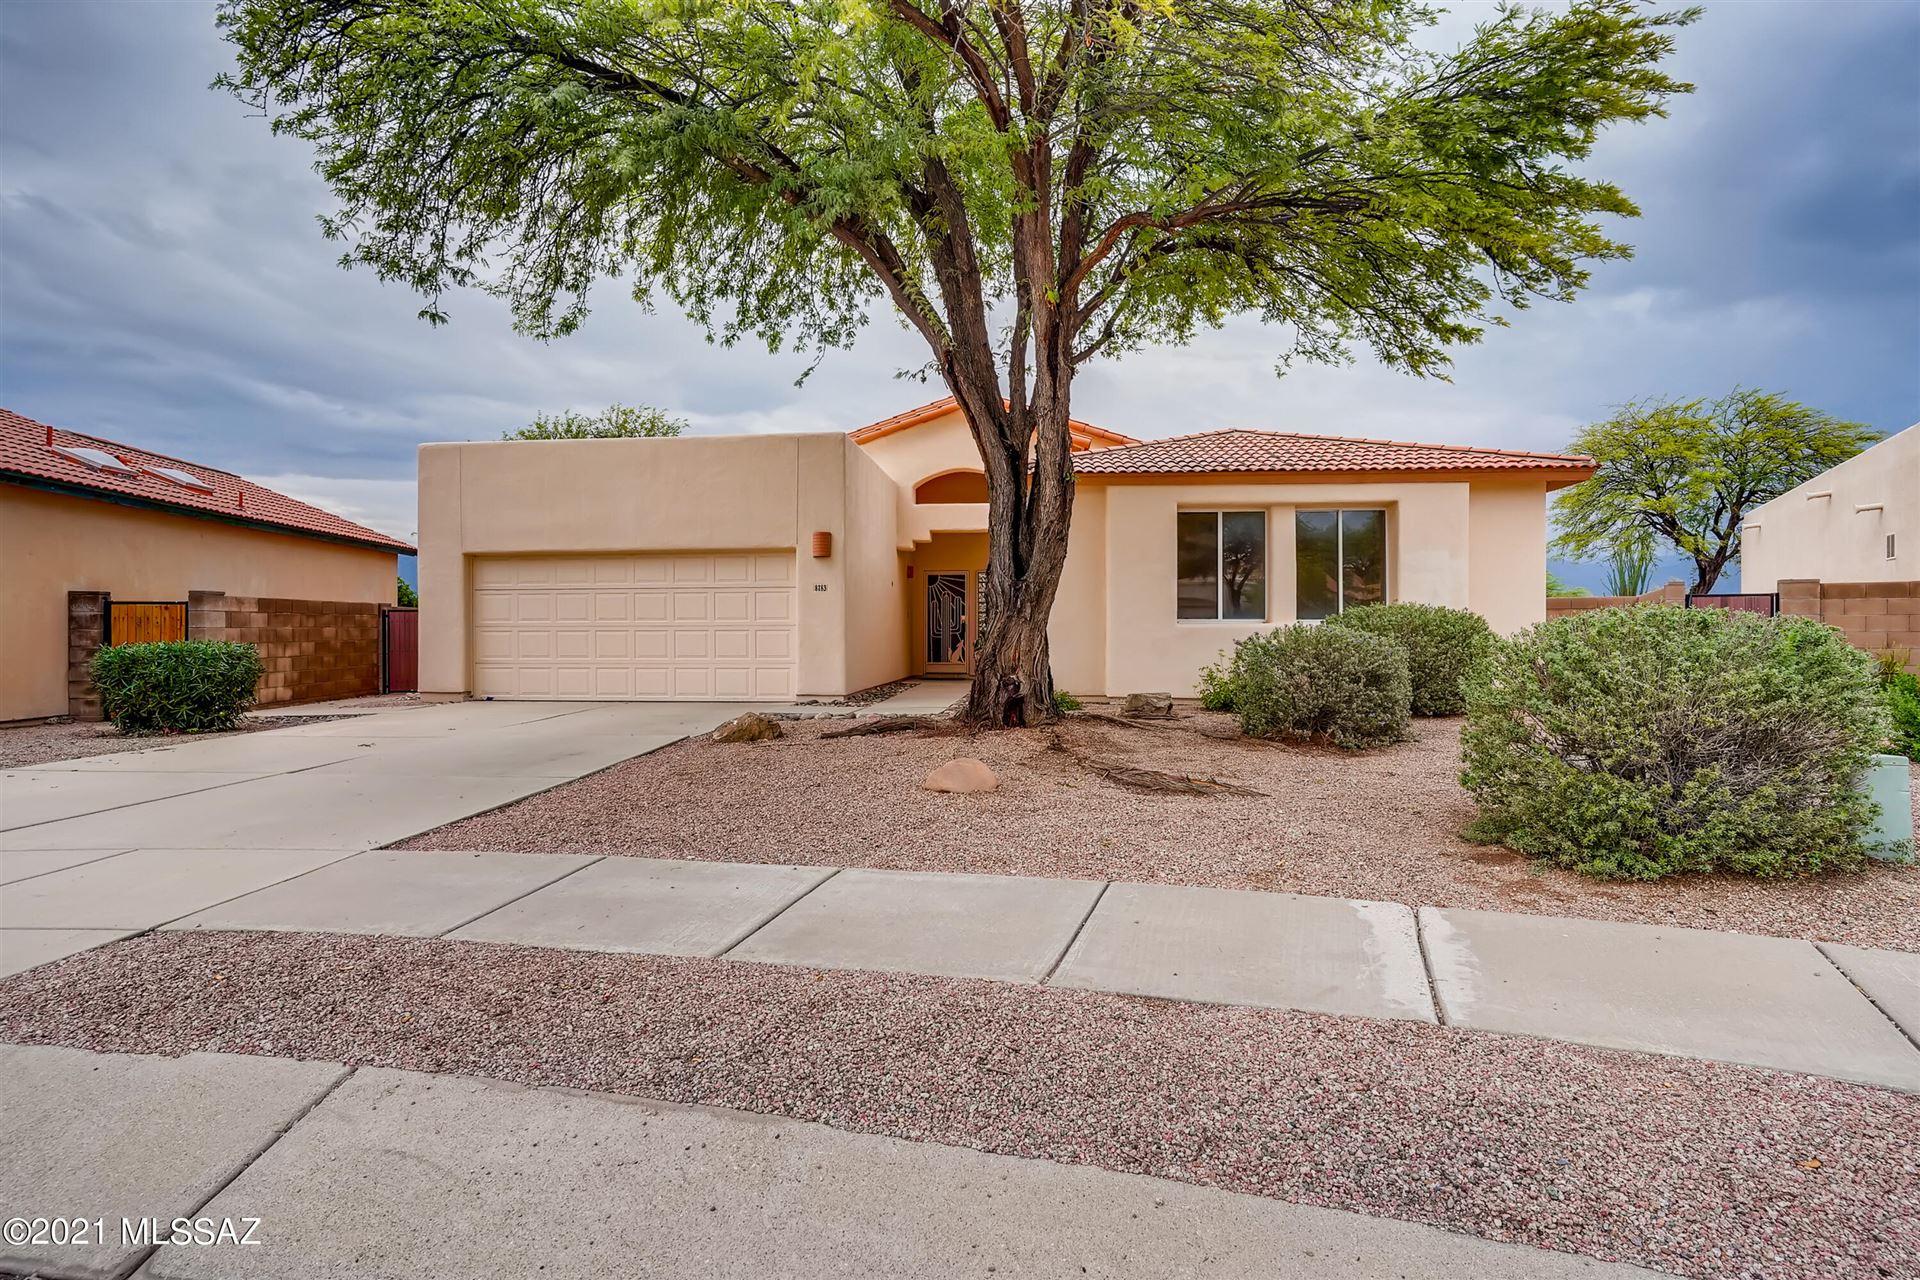 8783 E Desert Hibiscus Place, Tucson, AZ 85715 - MLS#: 22119000